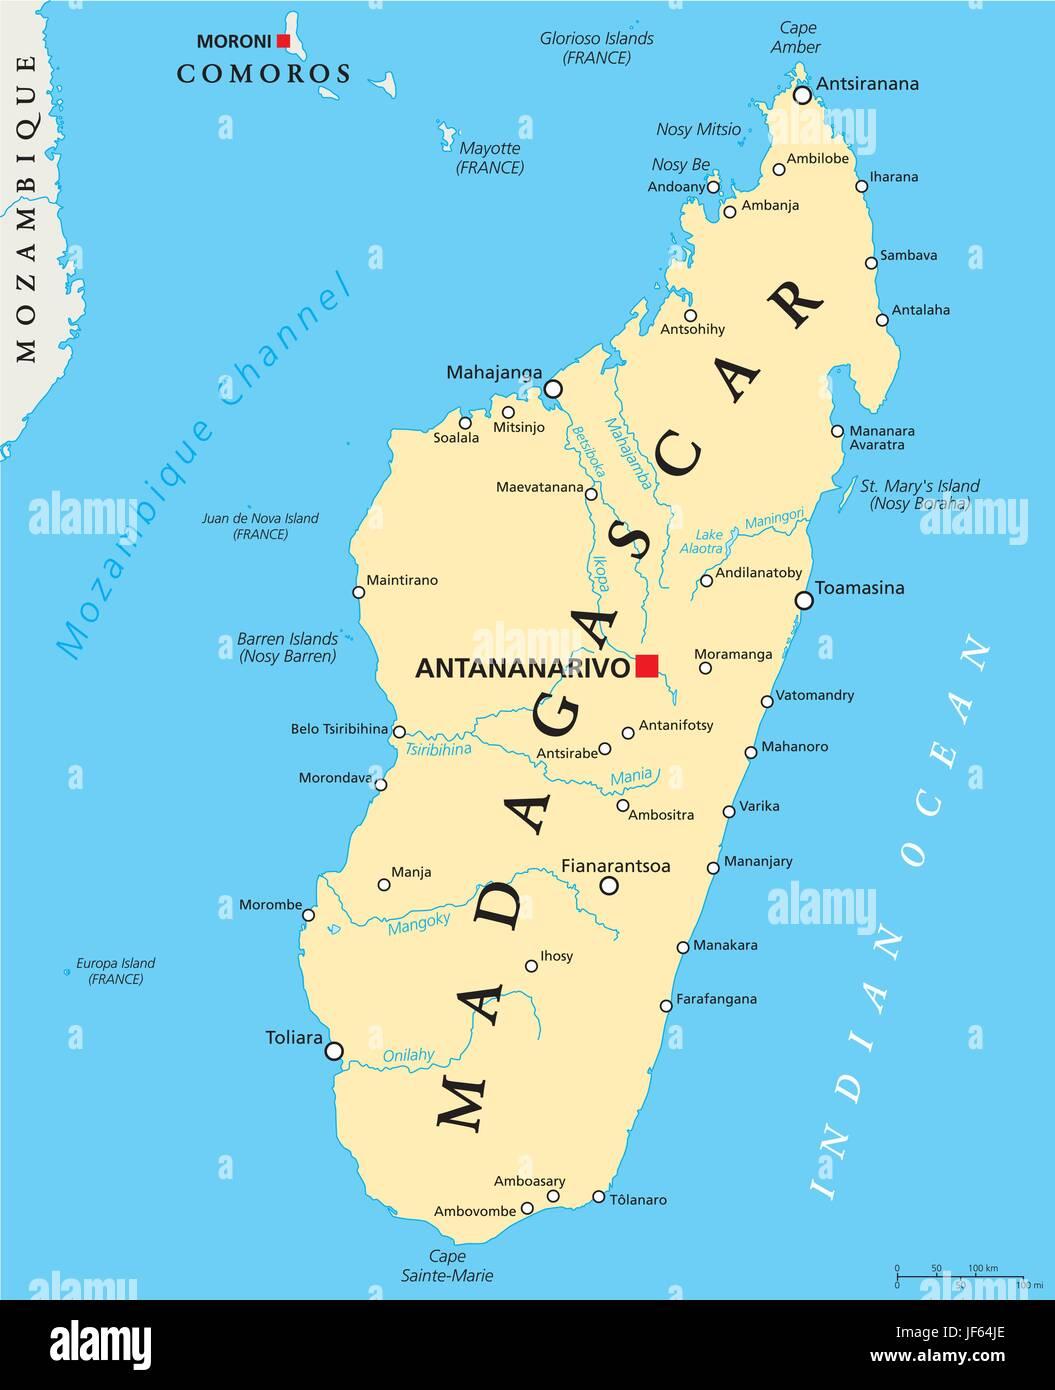 Isla De Madagascar Mapa.Madagascar Mapas Atlas Mapa Del Mundo Viajes Africa El Pais La Isla Imagen Vector De Stock Alamy